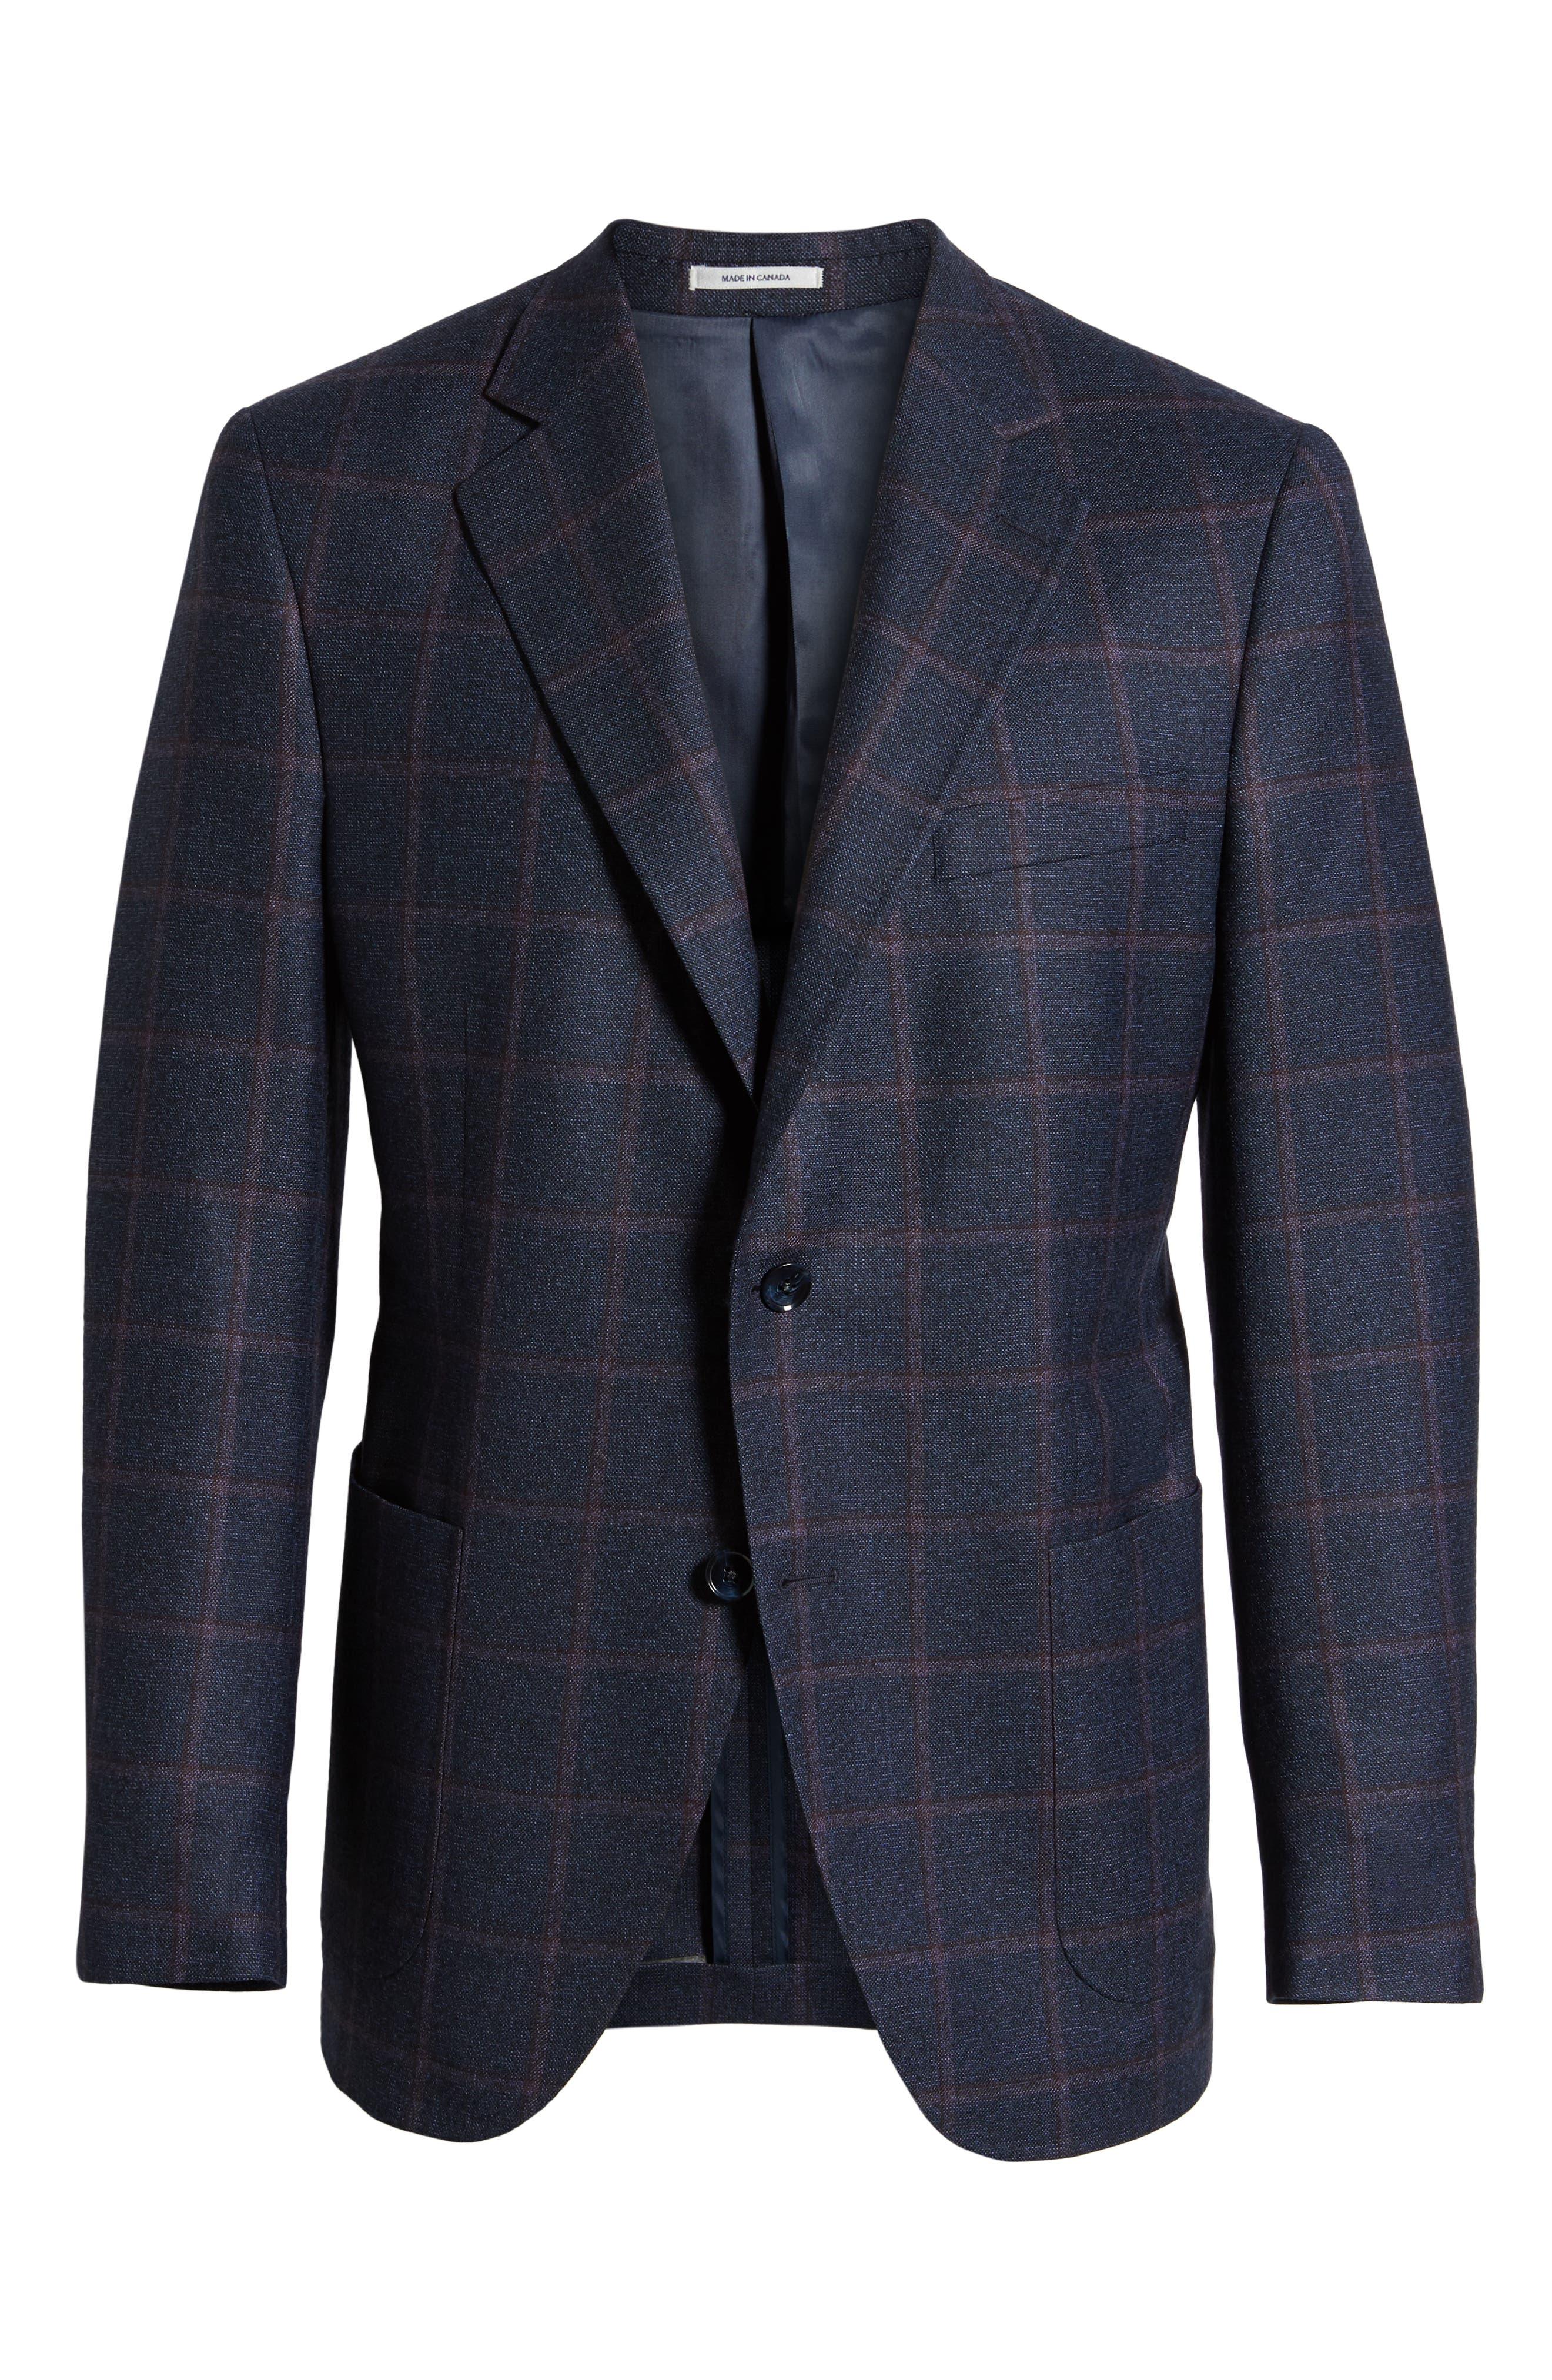 Hyperlight Classic Fit Wool Sport Coat,                             Alternate thumbnail 5, color,                             NAVY